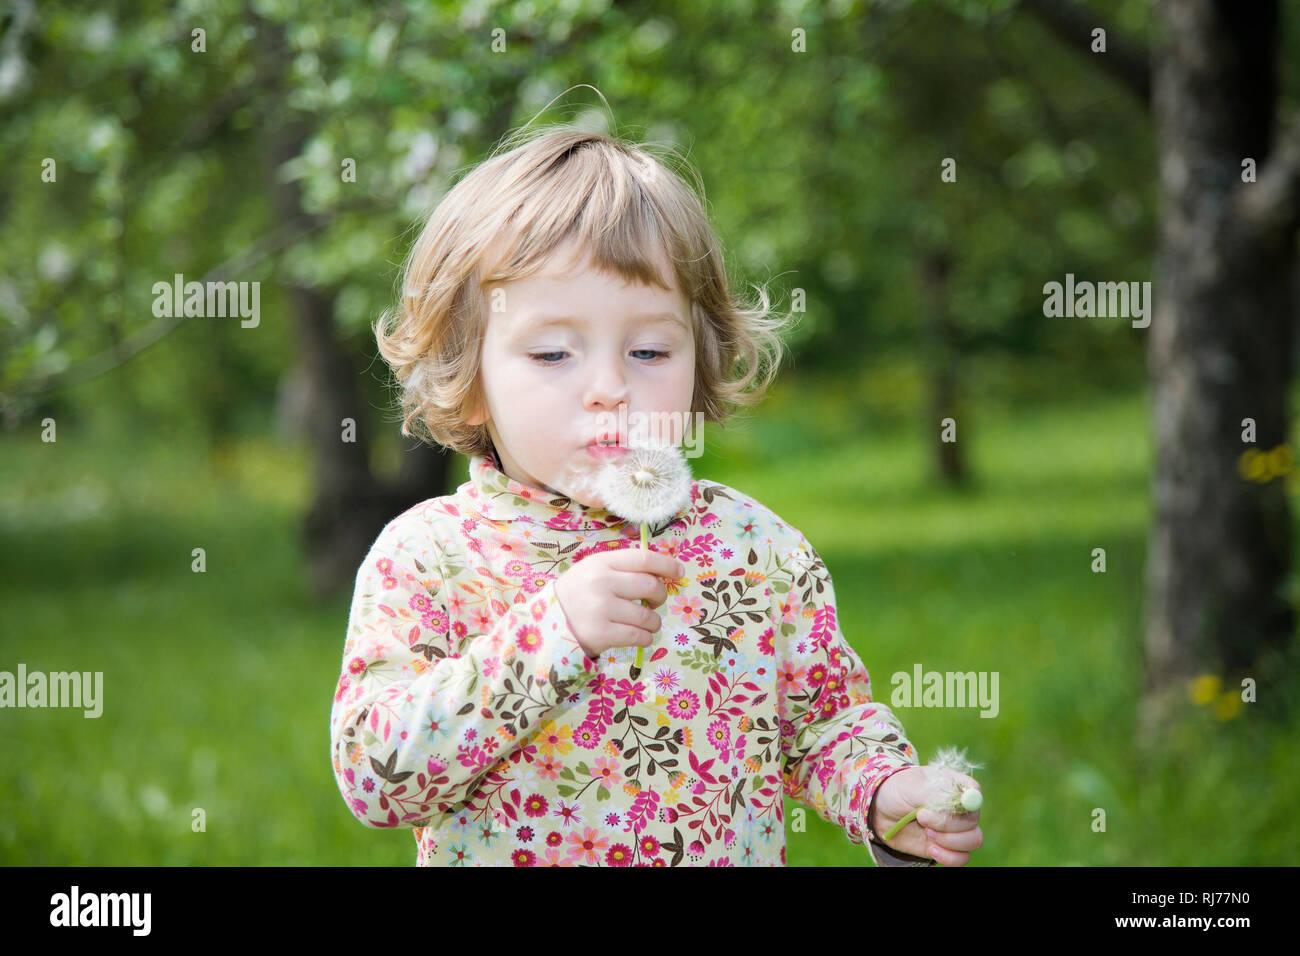 Mädchen, 3 Jahre alt, mit Pusteblume Stock Photo